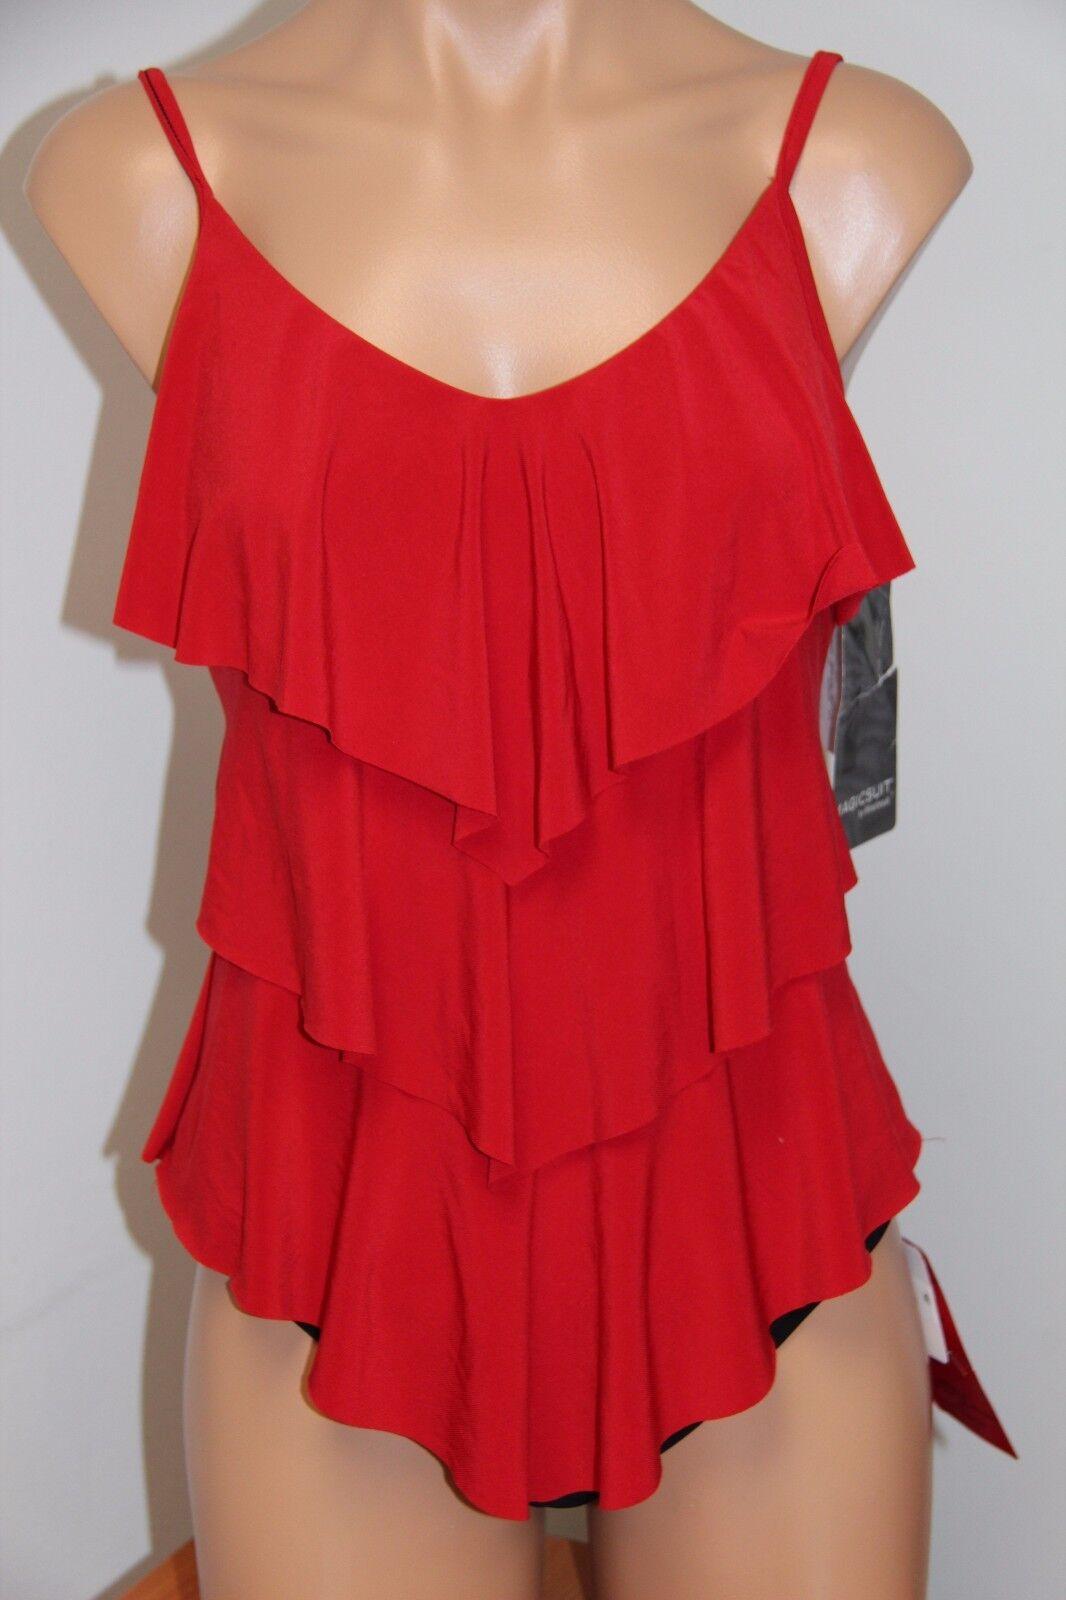 NWT Magic Suit Swimsuit Tankini 2 pc set sz 8 Red Ruffle High Waist